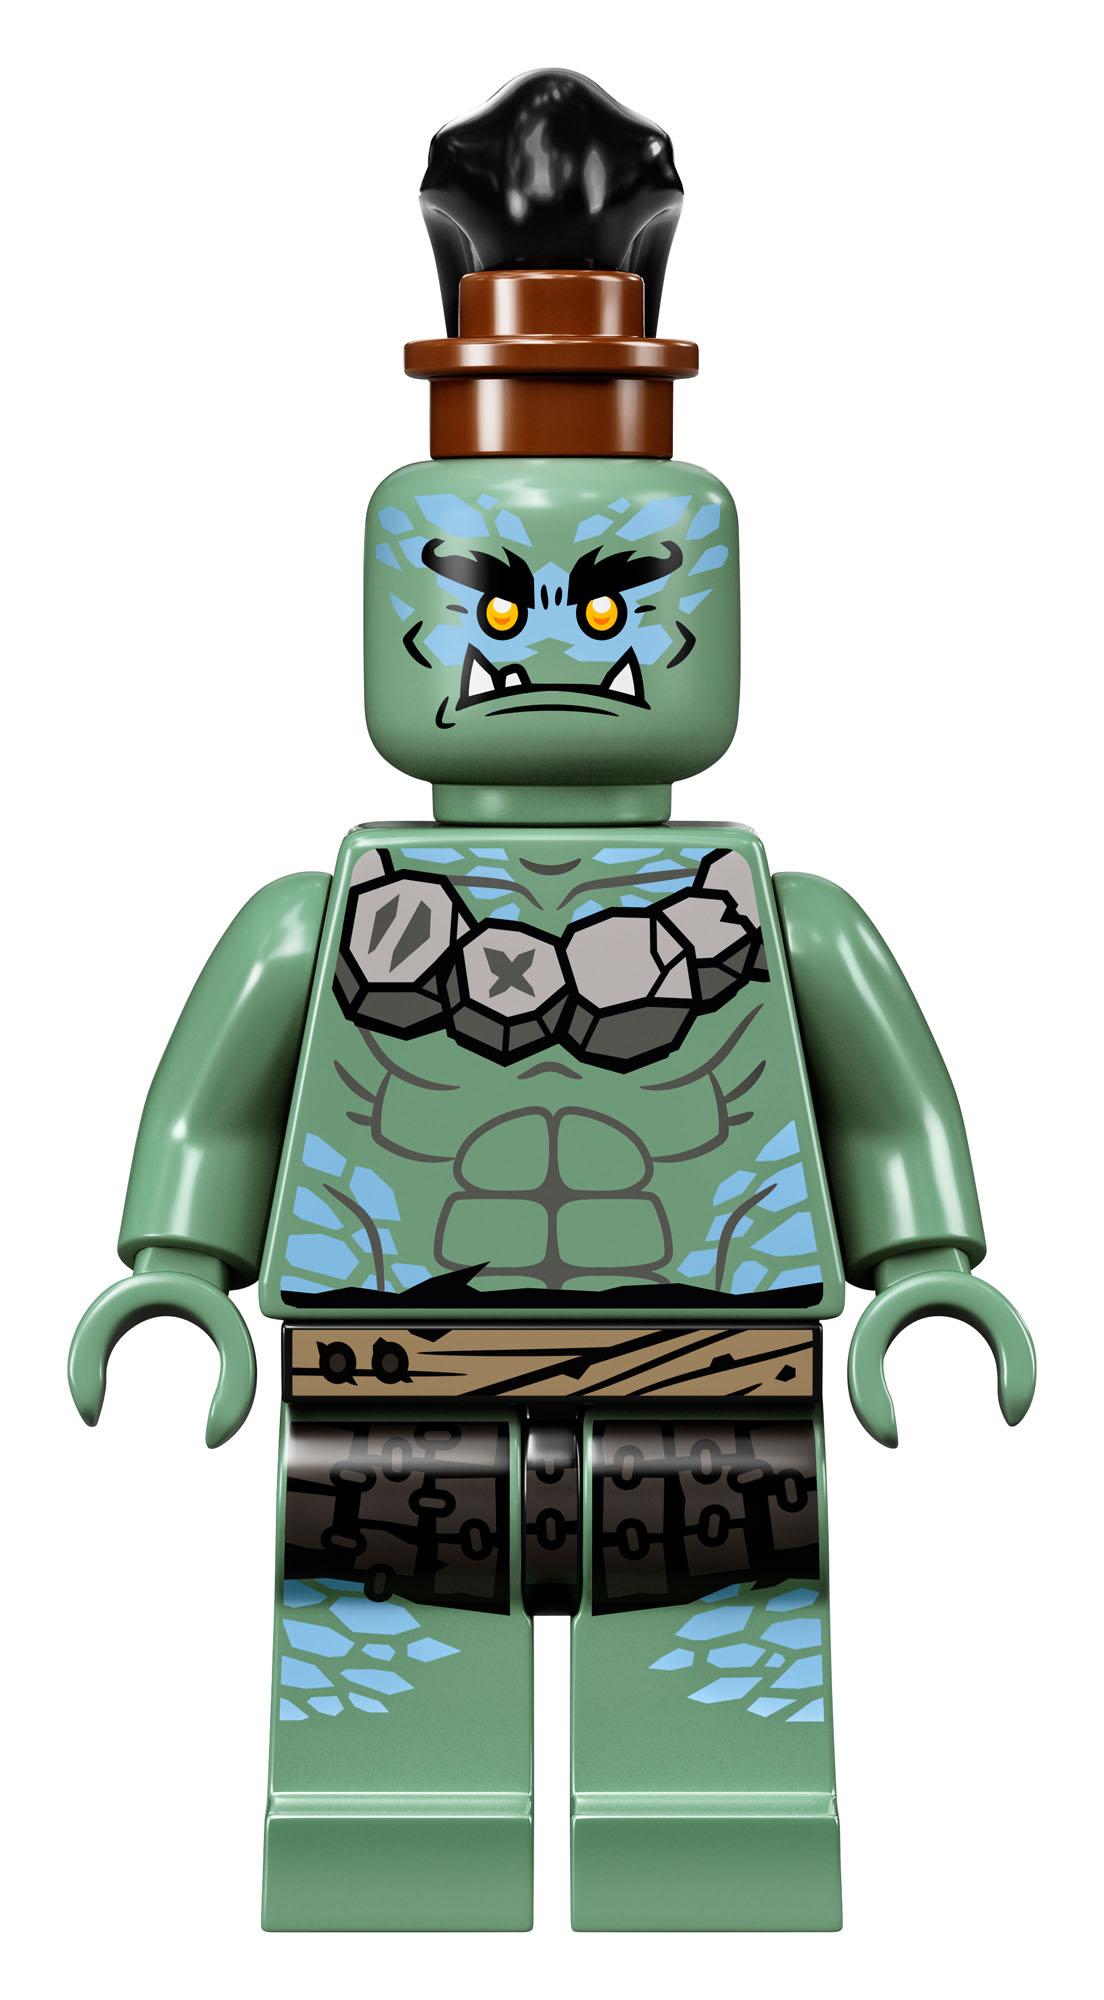 71720 LEGO Ninjago Fire Stone Mech Ninja Building Set 968 ...